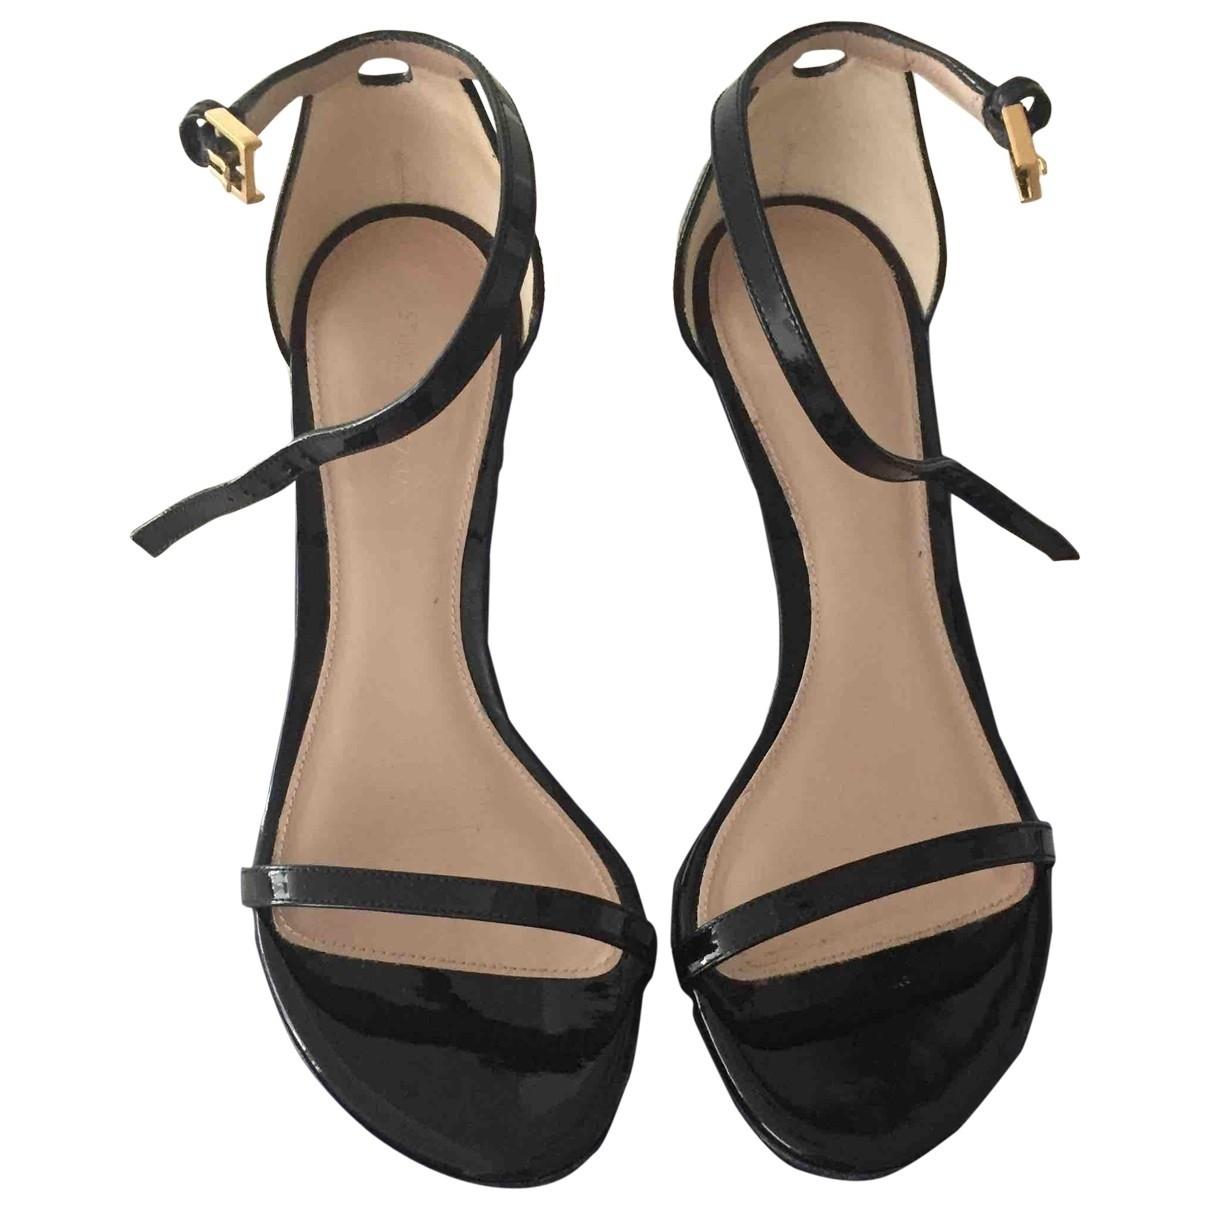 Stuart Weitzman \N Black Patent leather Sandals for Women 36 EU